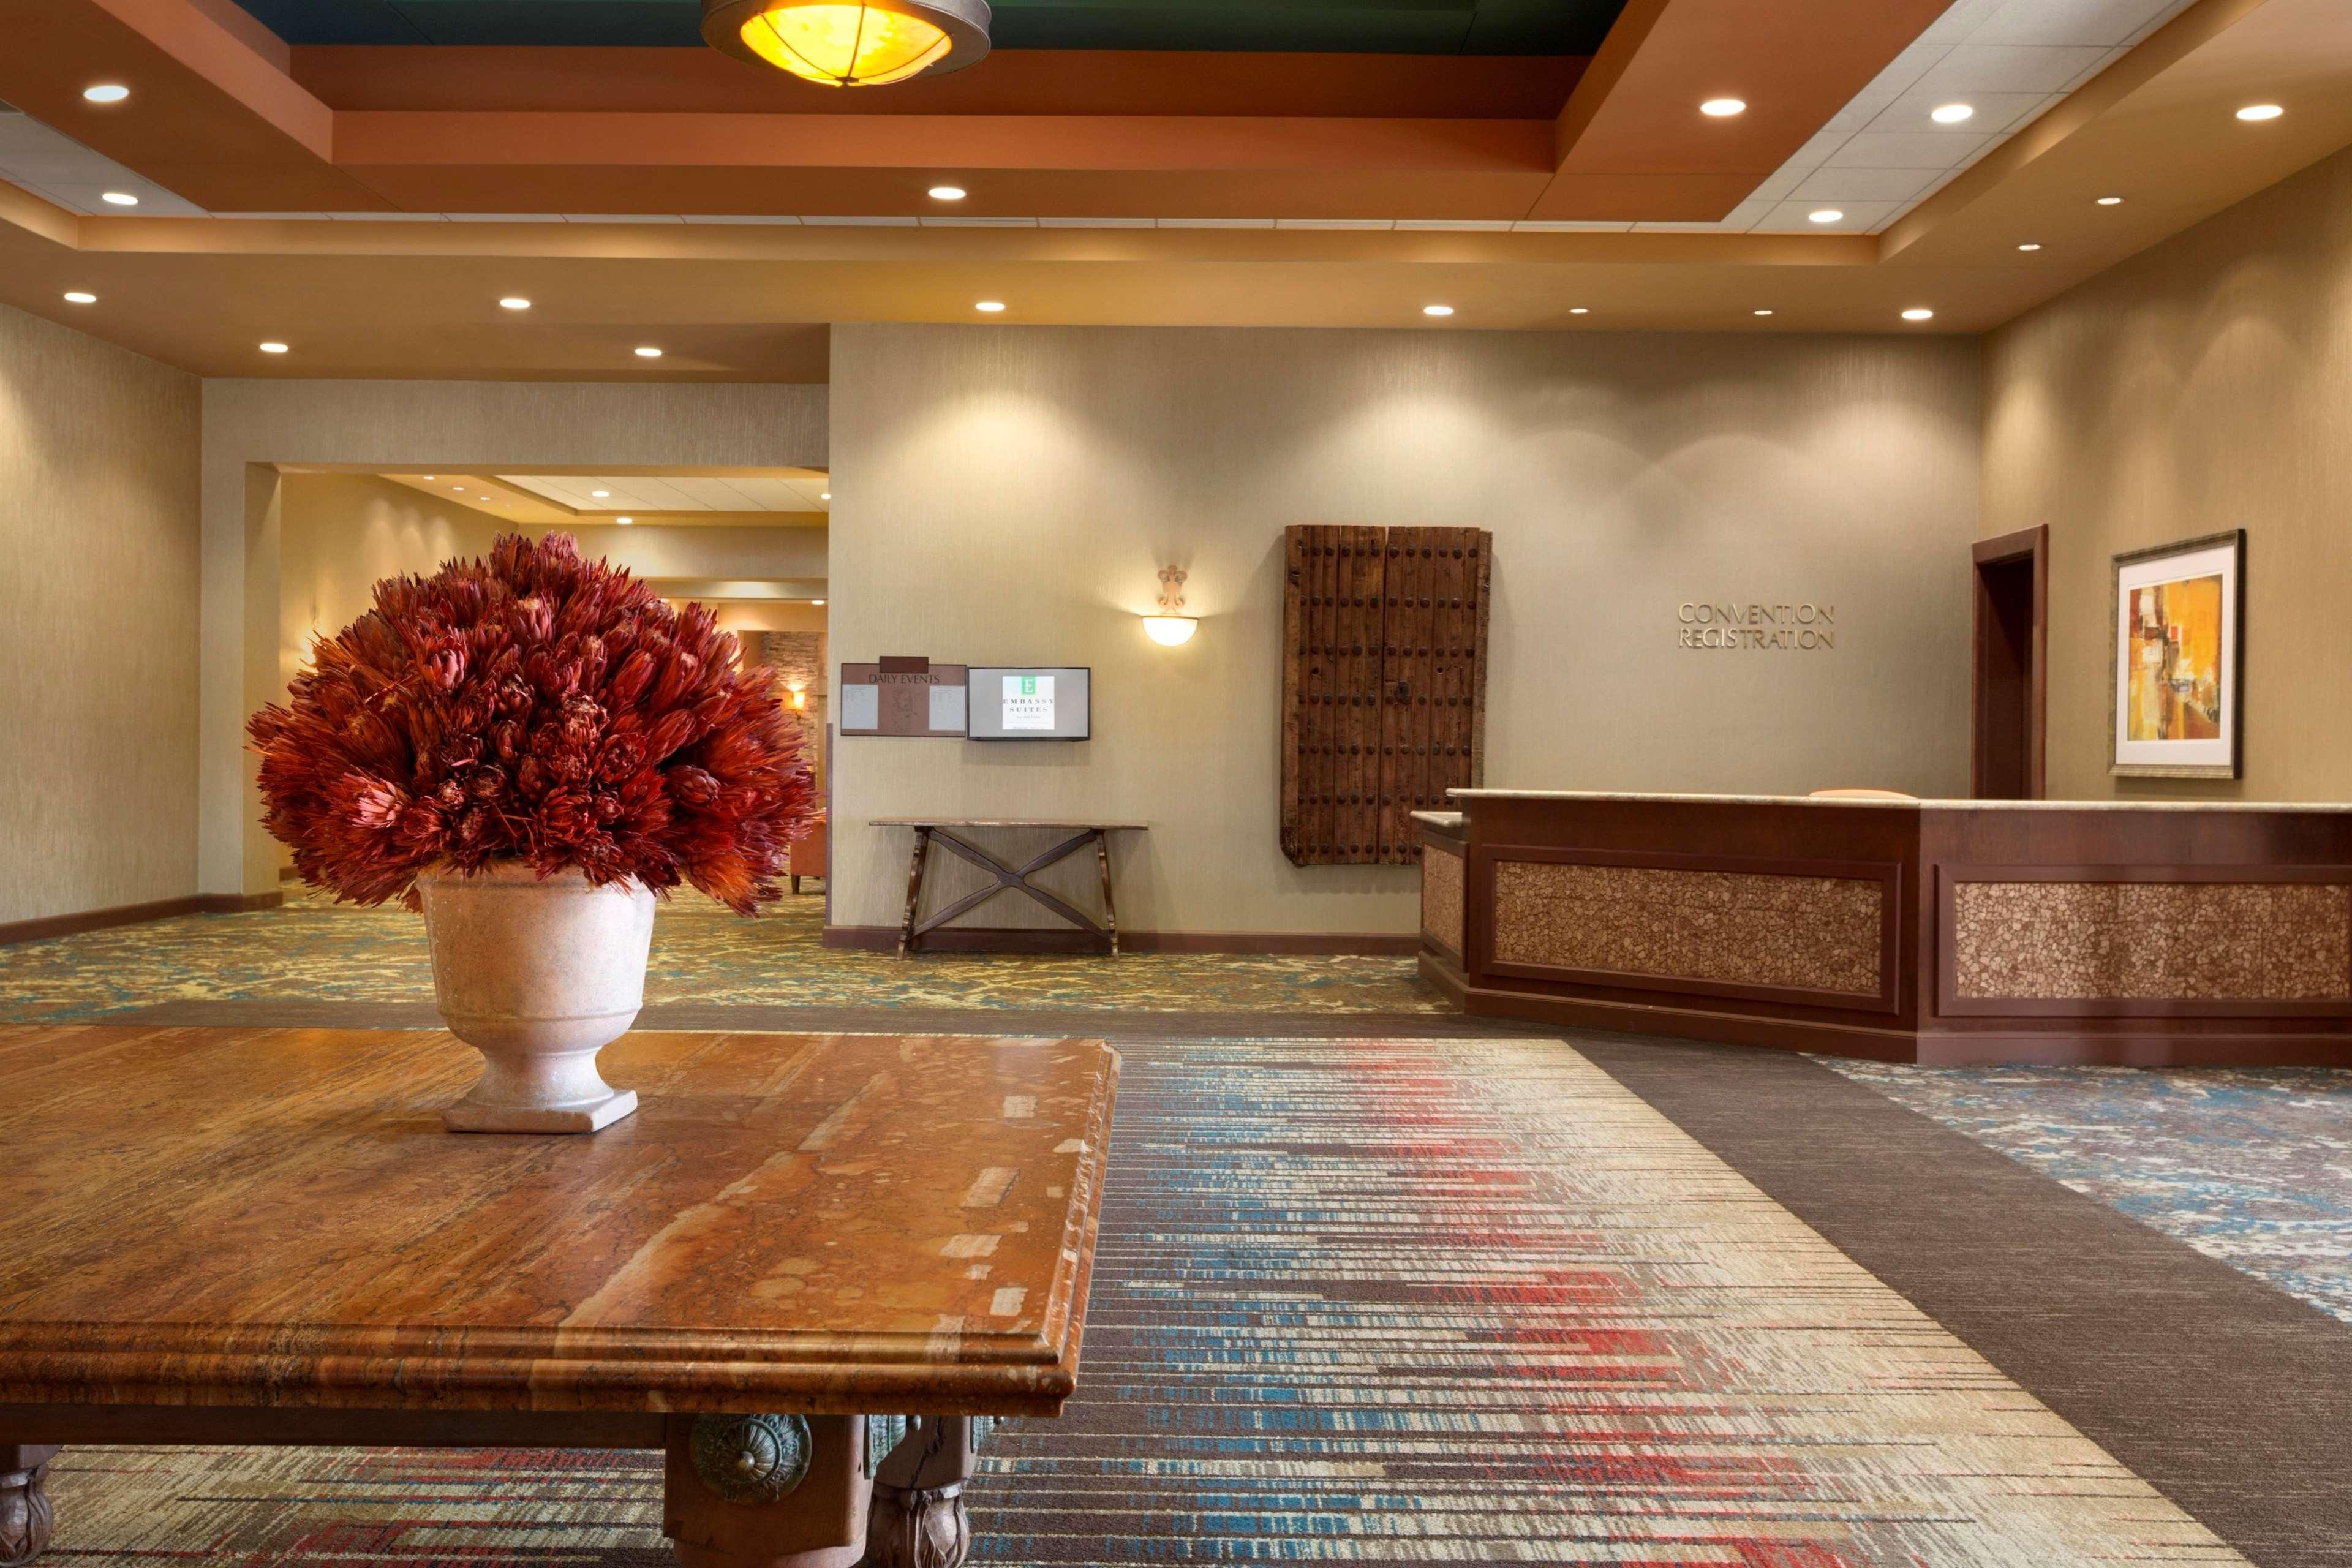 Embassy Suites by Hilton Albuquerque Hotel & Spa image 45